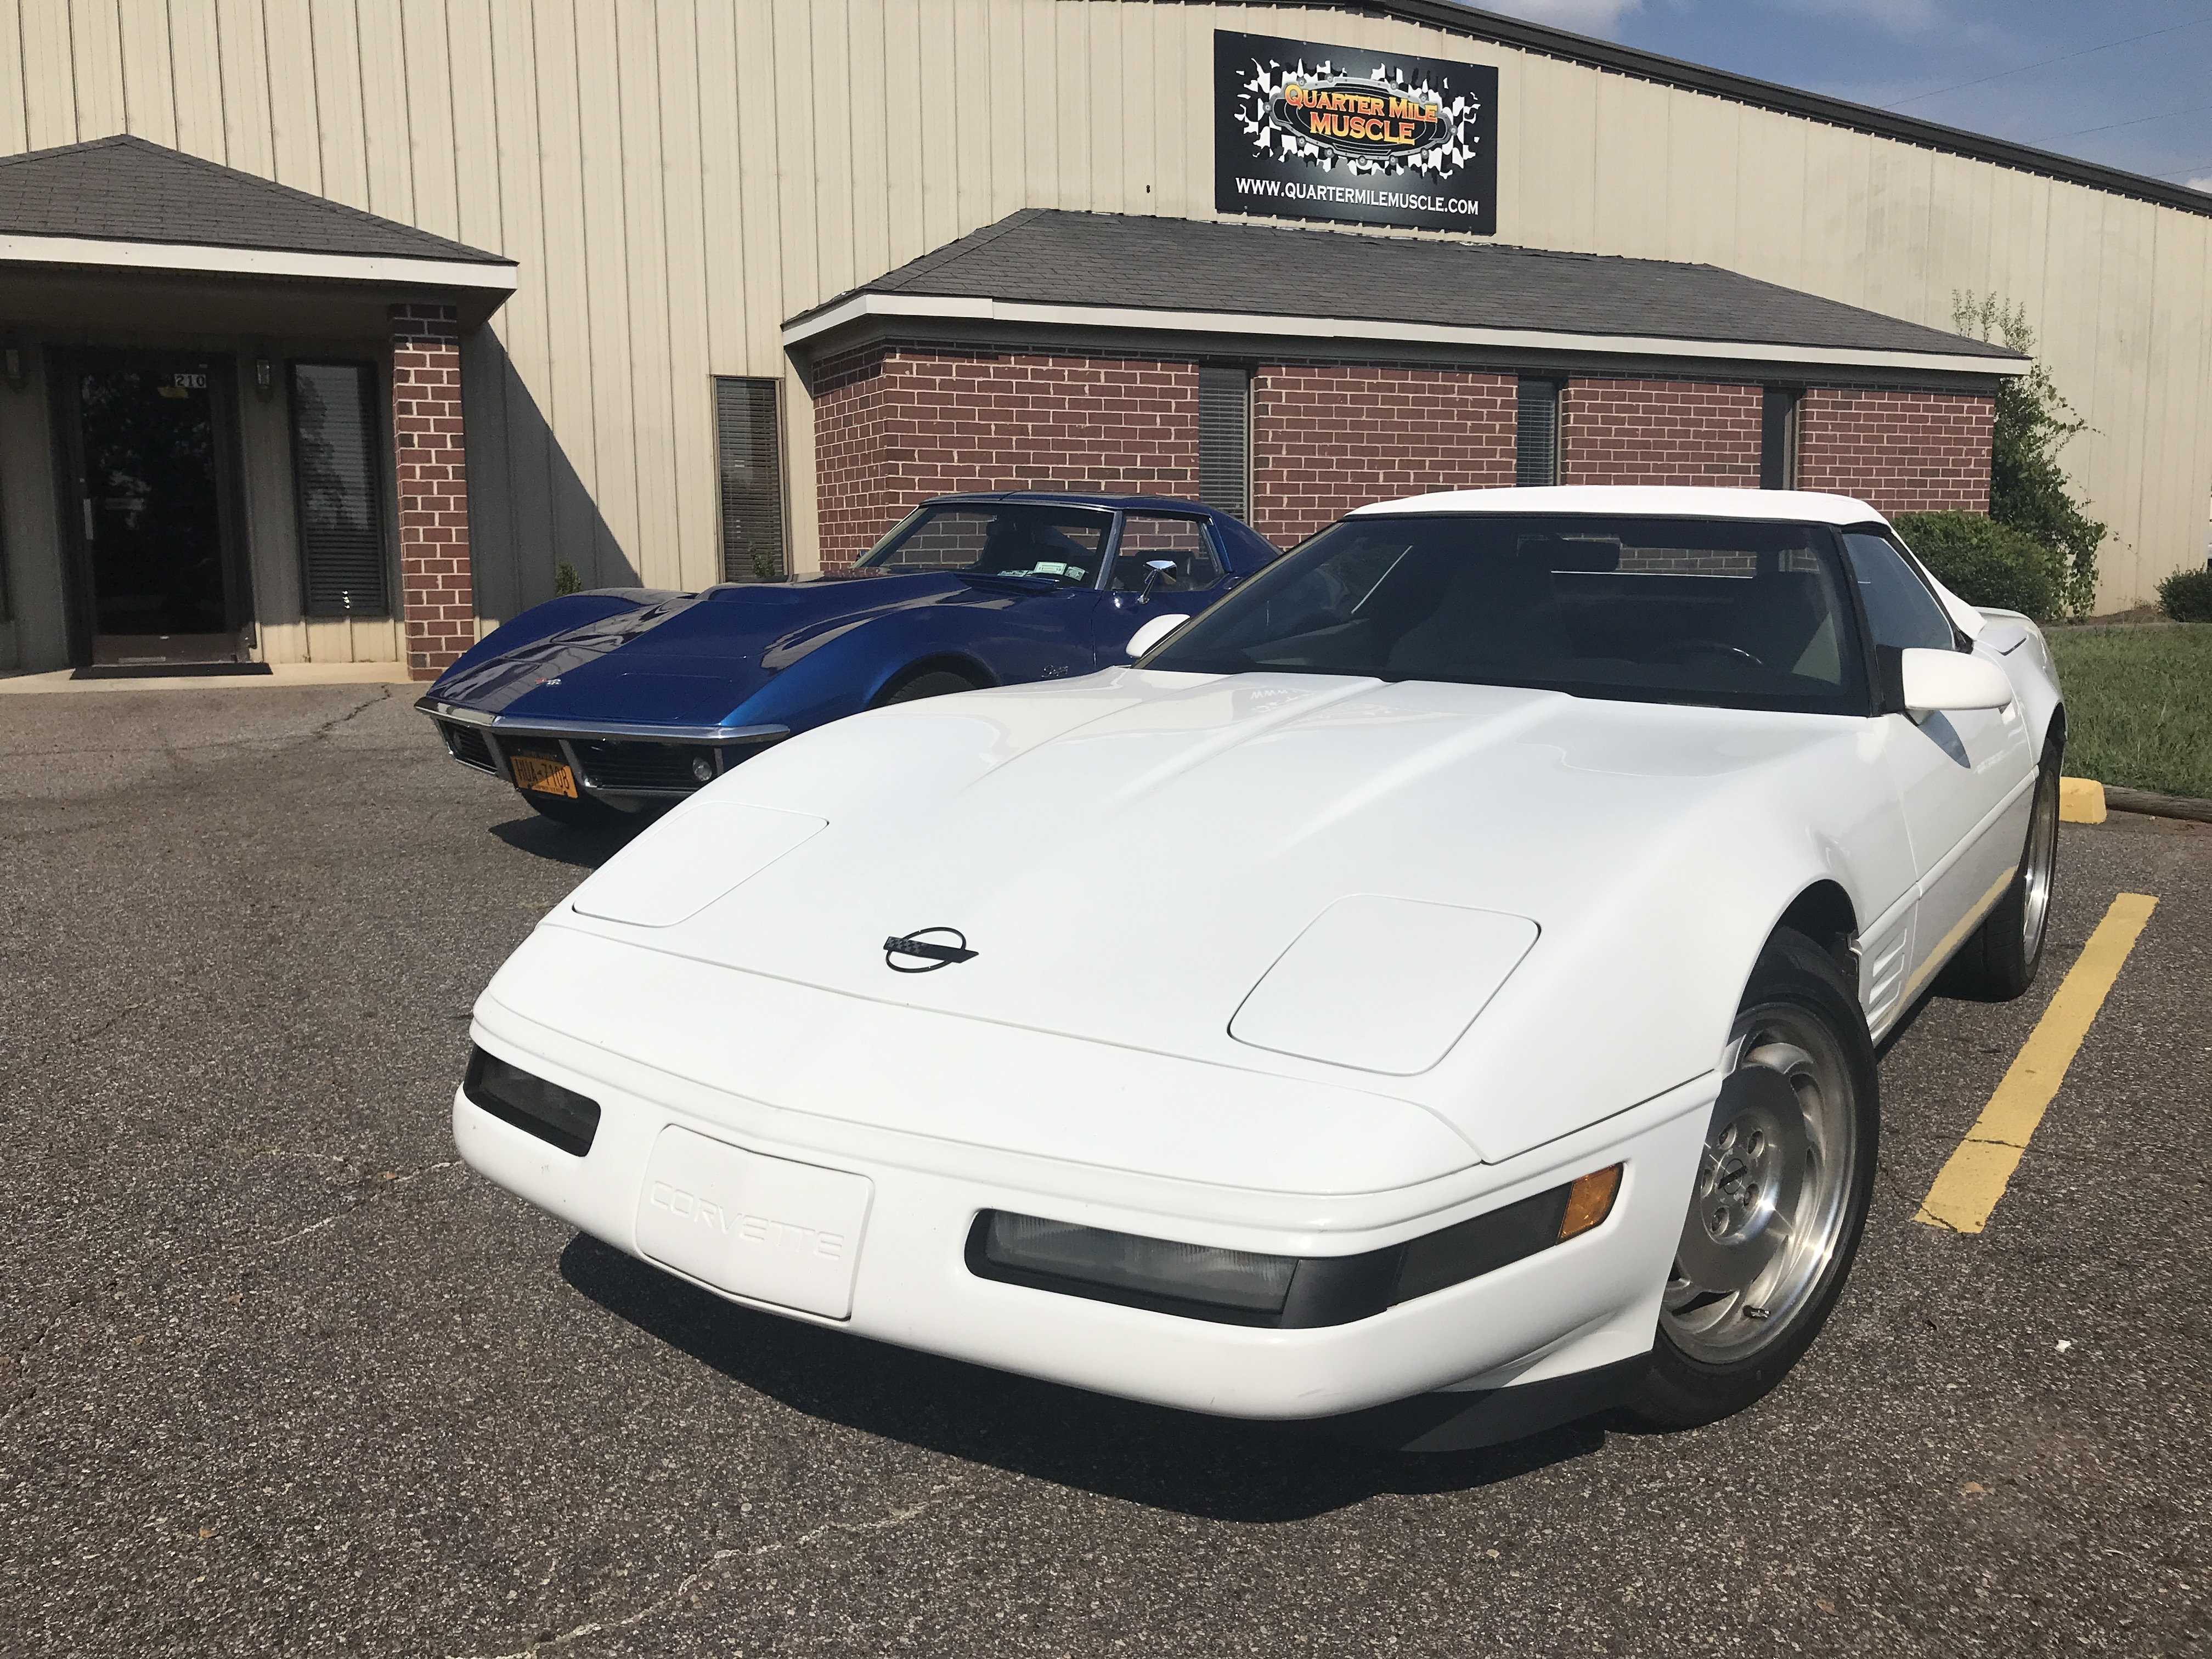 Classic Corvette Charlotte North Carolina